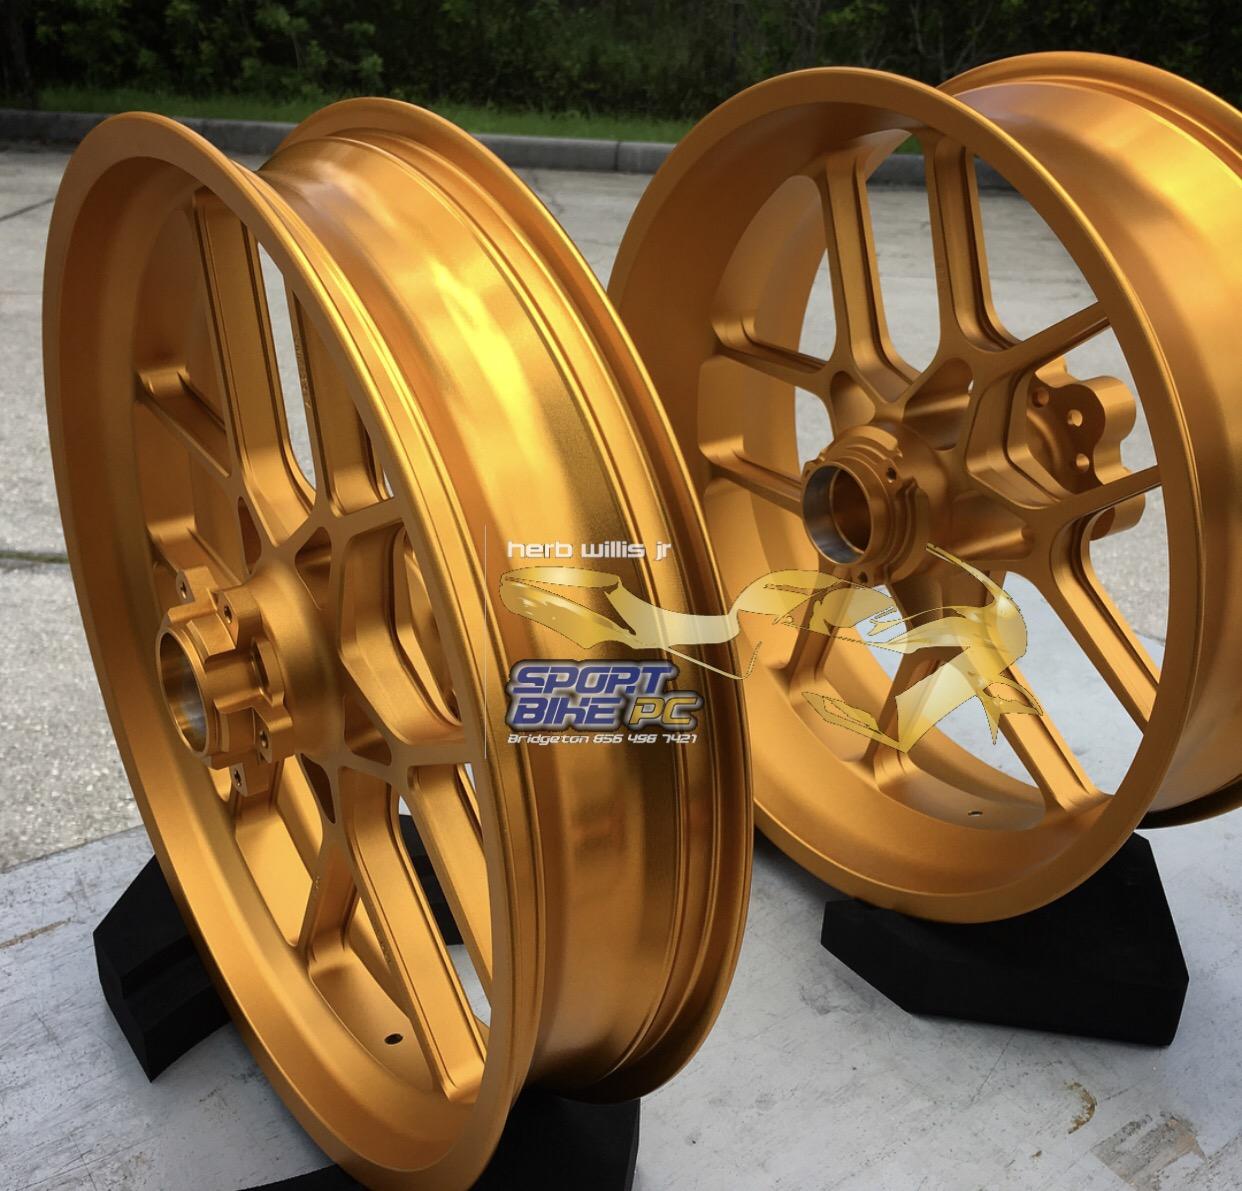 CARROZZERIA V-Track Forged Wheel Sets